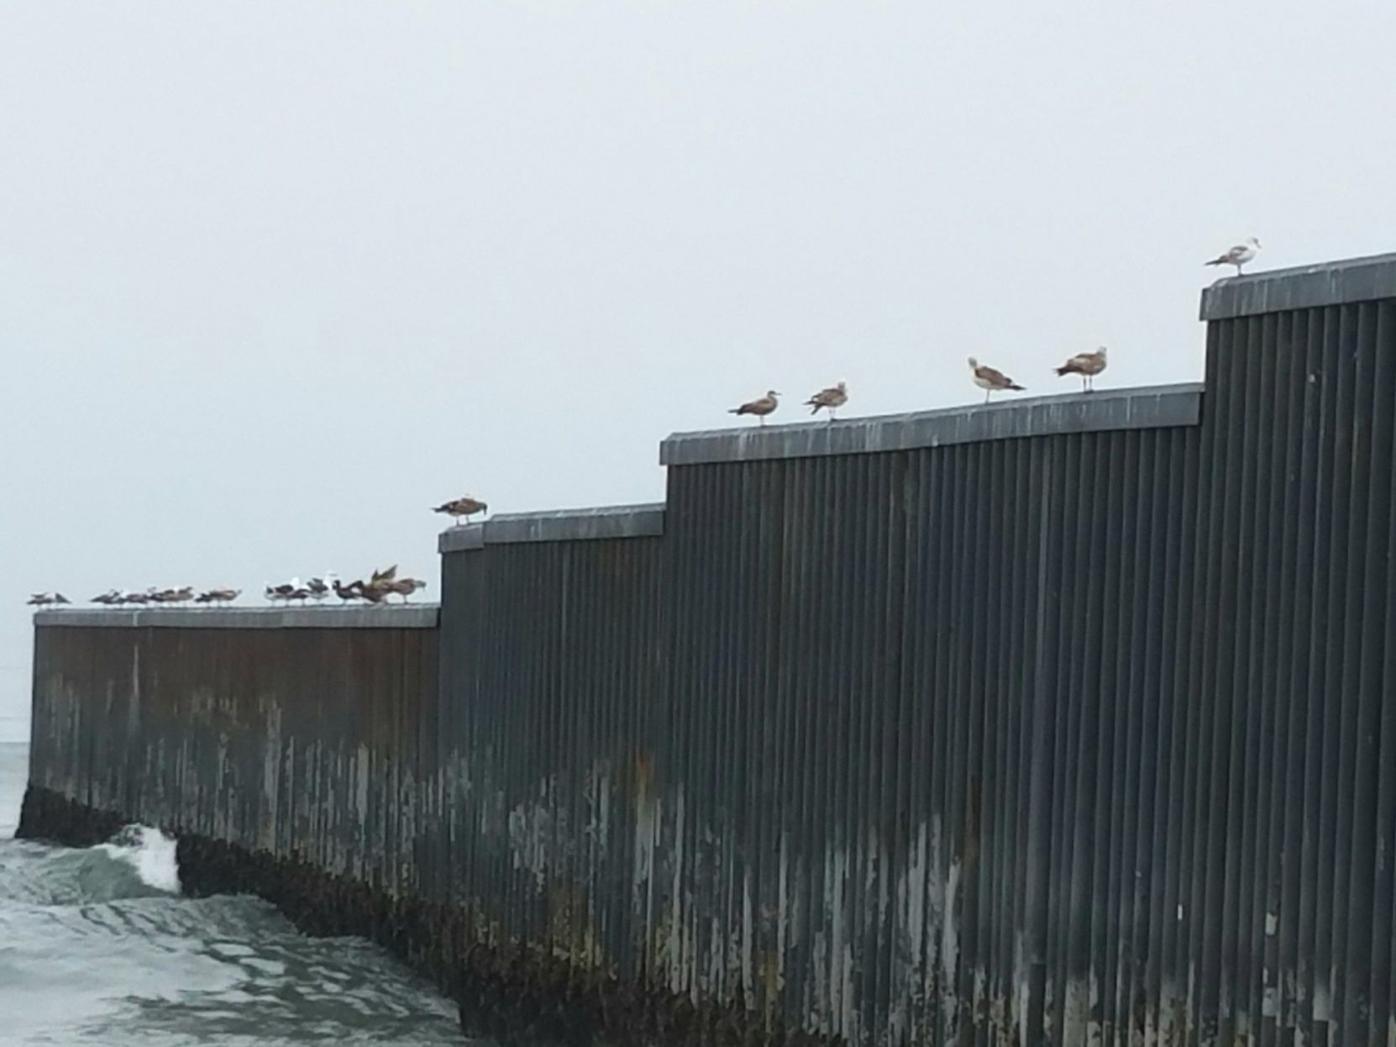 Birds on the border fence